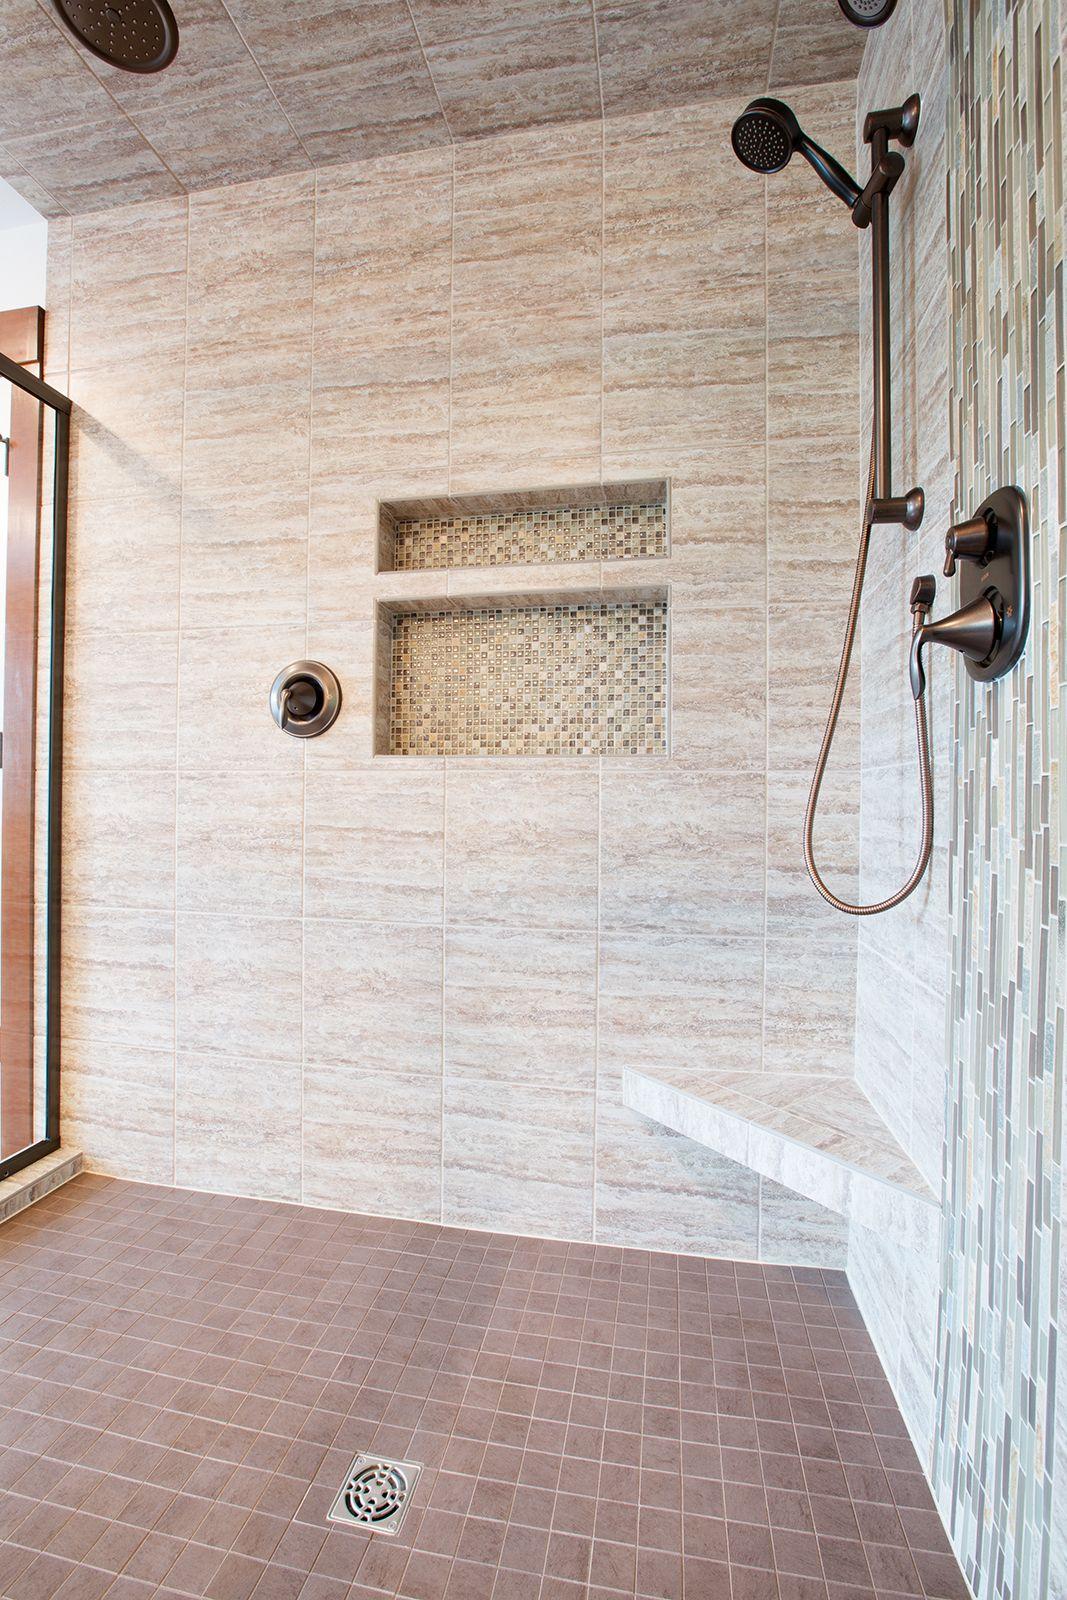 Beautiful Fully Tiled Shower Walls Floor Ceiling Moen Orb Rain Shower Head And Hand Held Shower Head Built Shower Wall Master Bathroom Layout Shower Tile